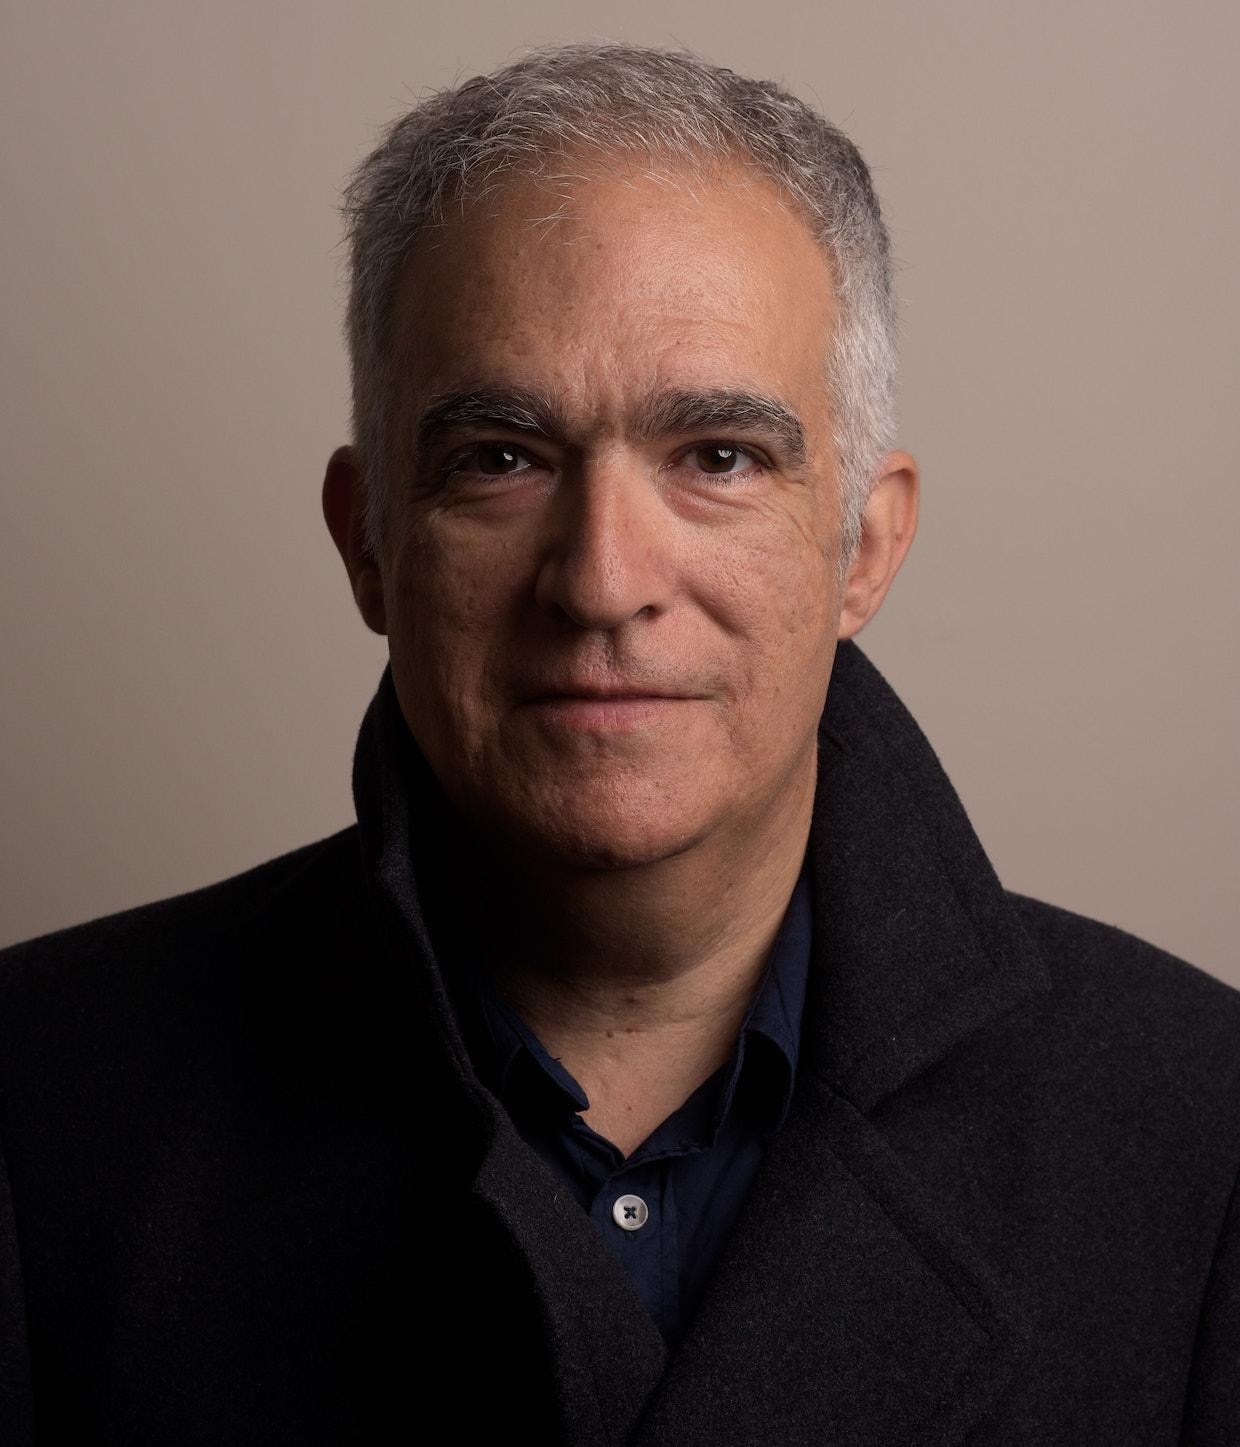 David Rosa